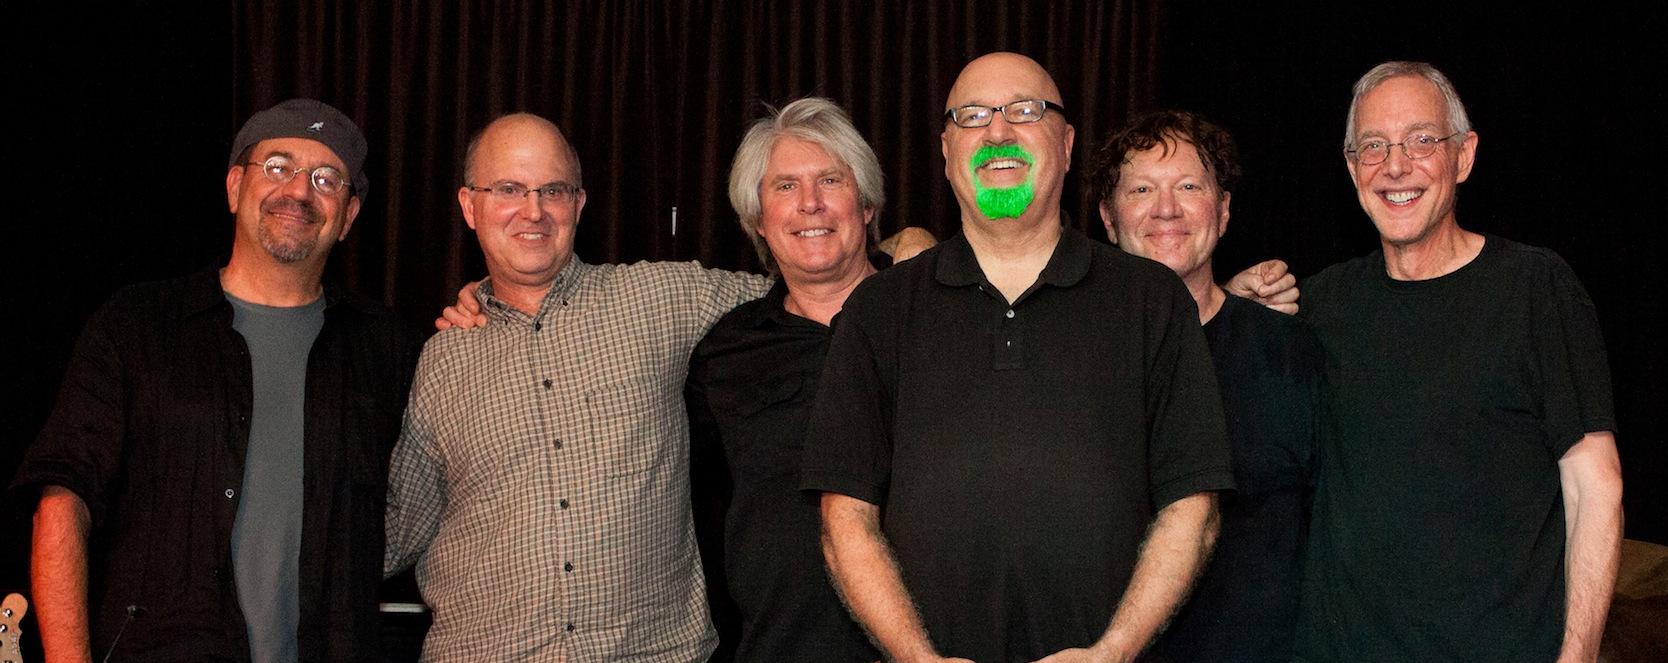 Frank Macchia's Swamp Thang Band